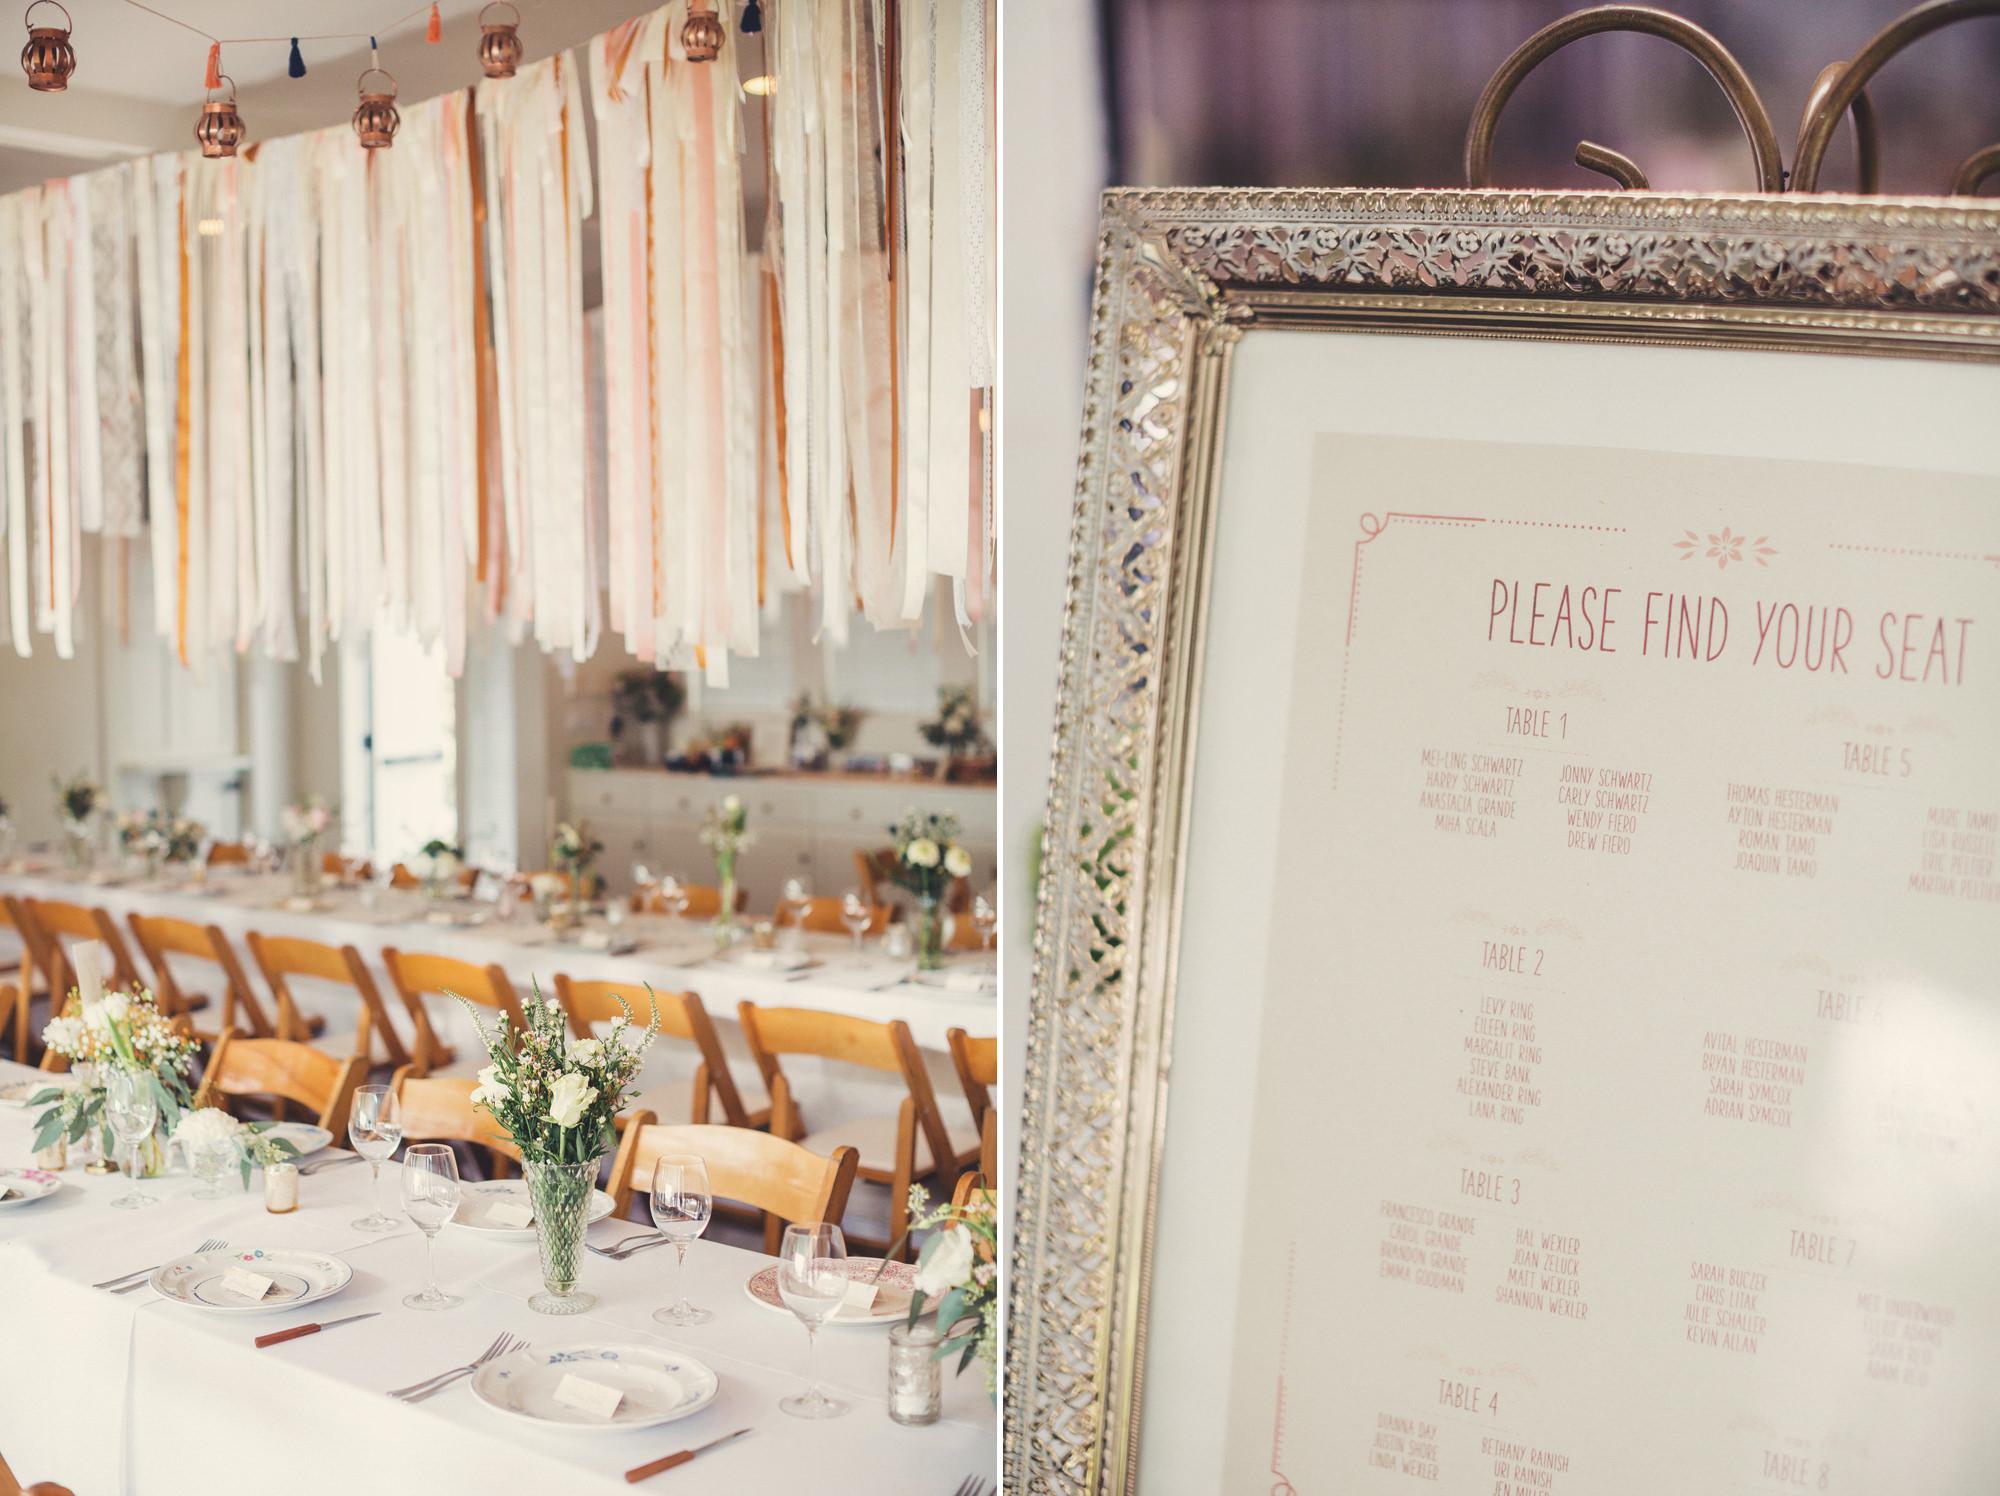 Little River Inn Wedding@Anne-Claire Brun 151